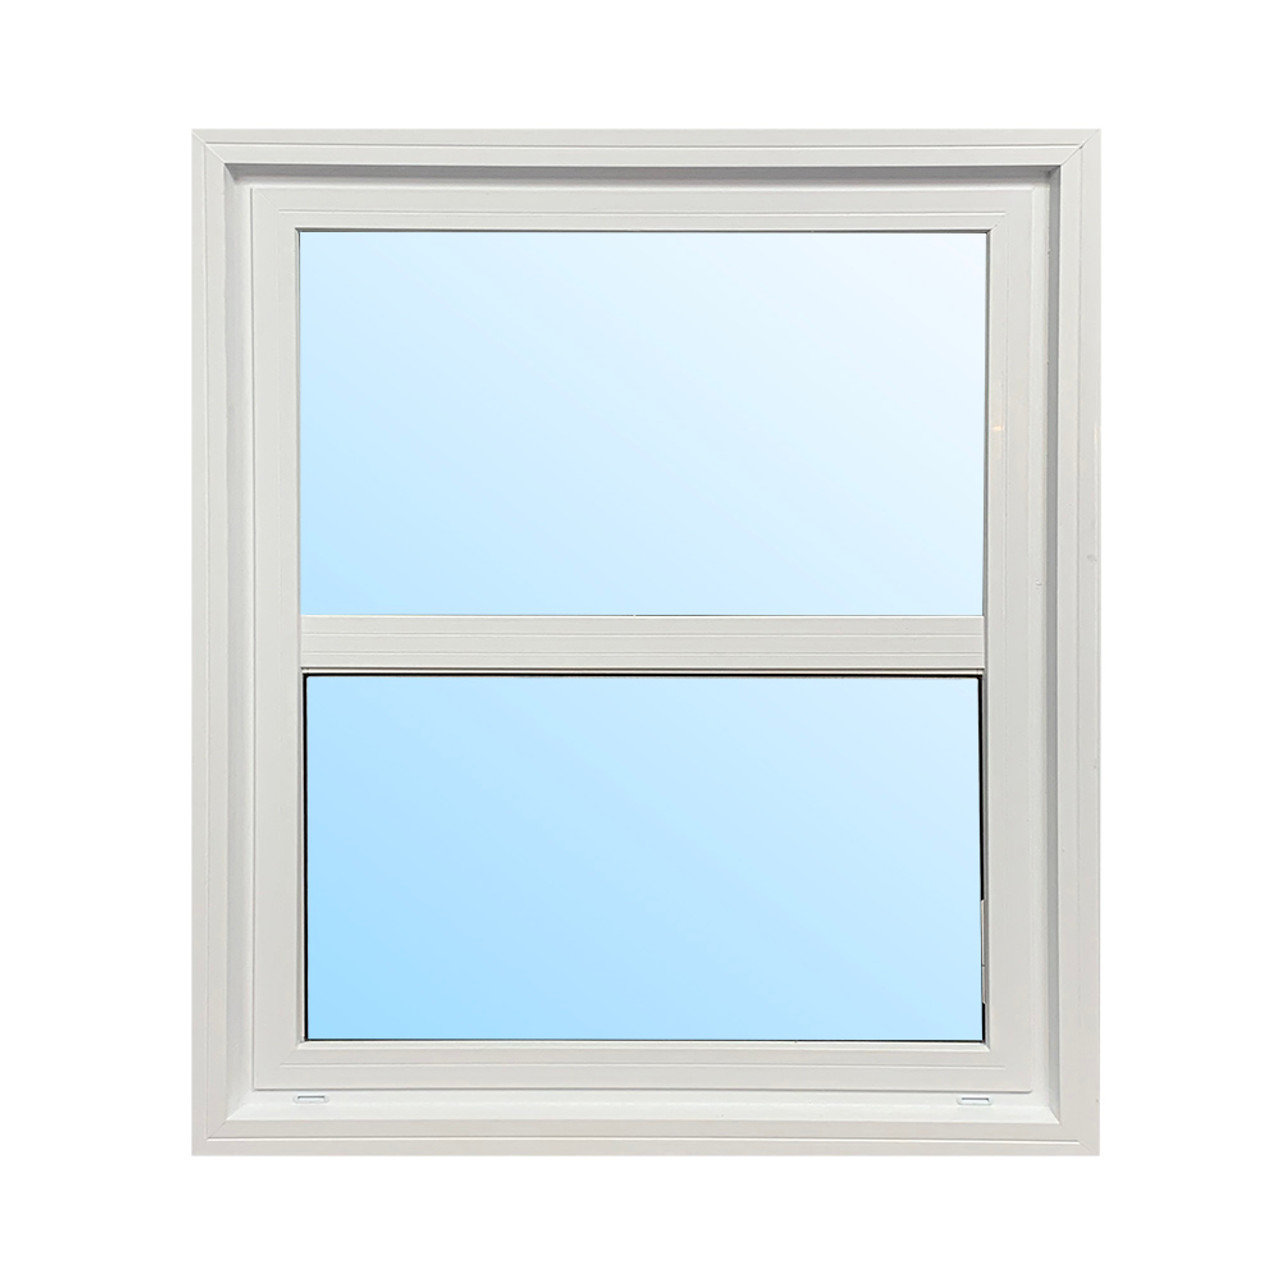 "Castlegard | 36"" x 36"" Single Hung Window | LEA"